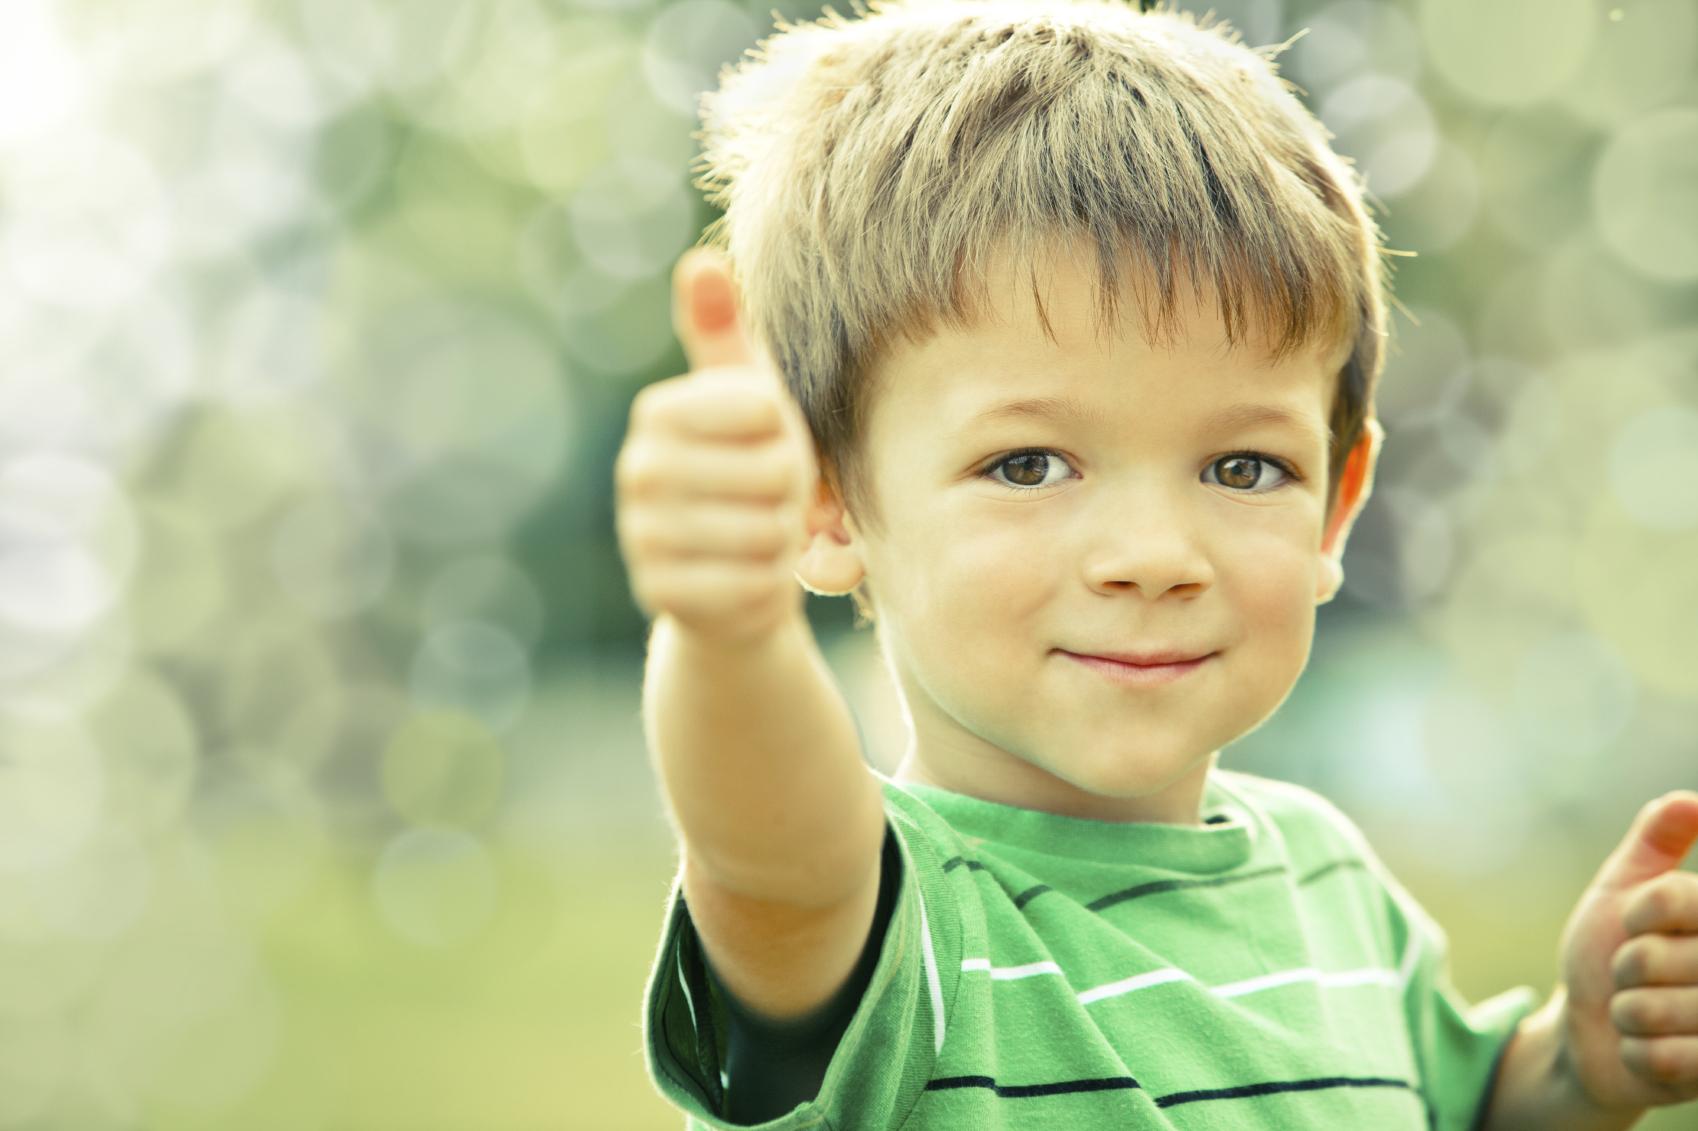 happy smiling kid outdoor doing OK portrait green tone